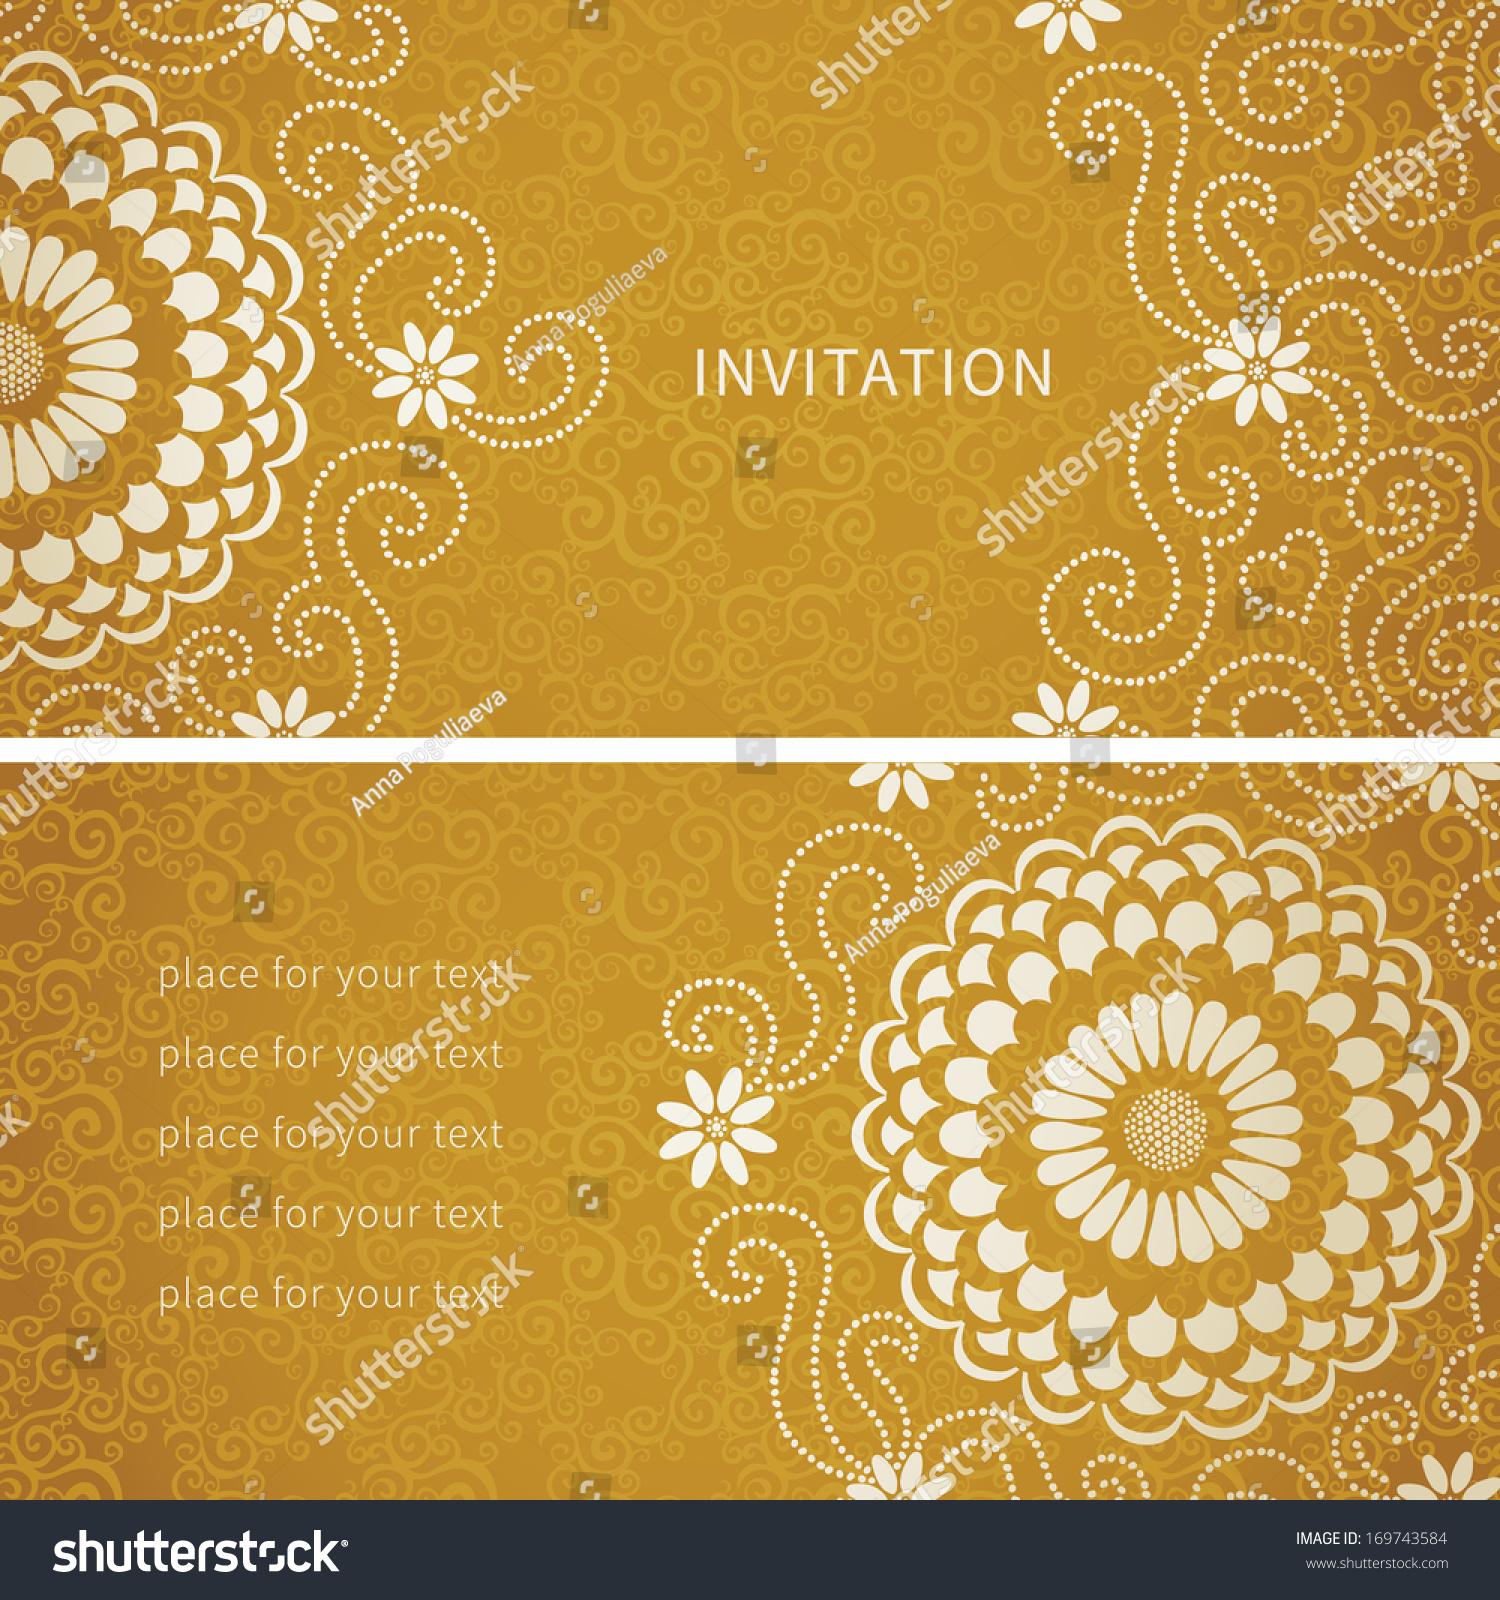 vintage invitation cards large flowers curls stock vector 169743584